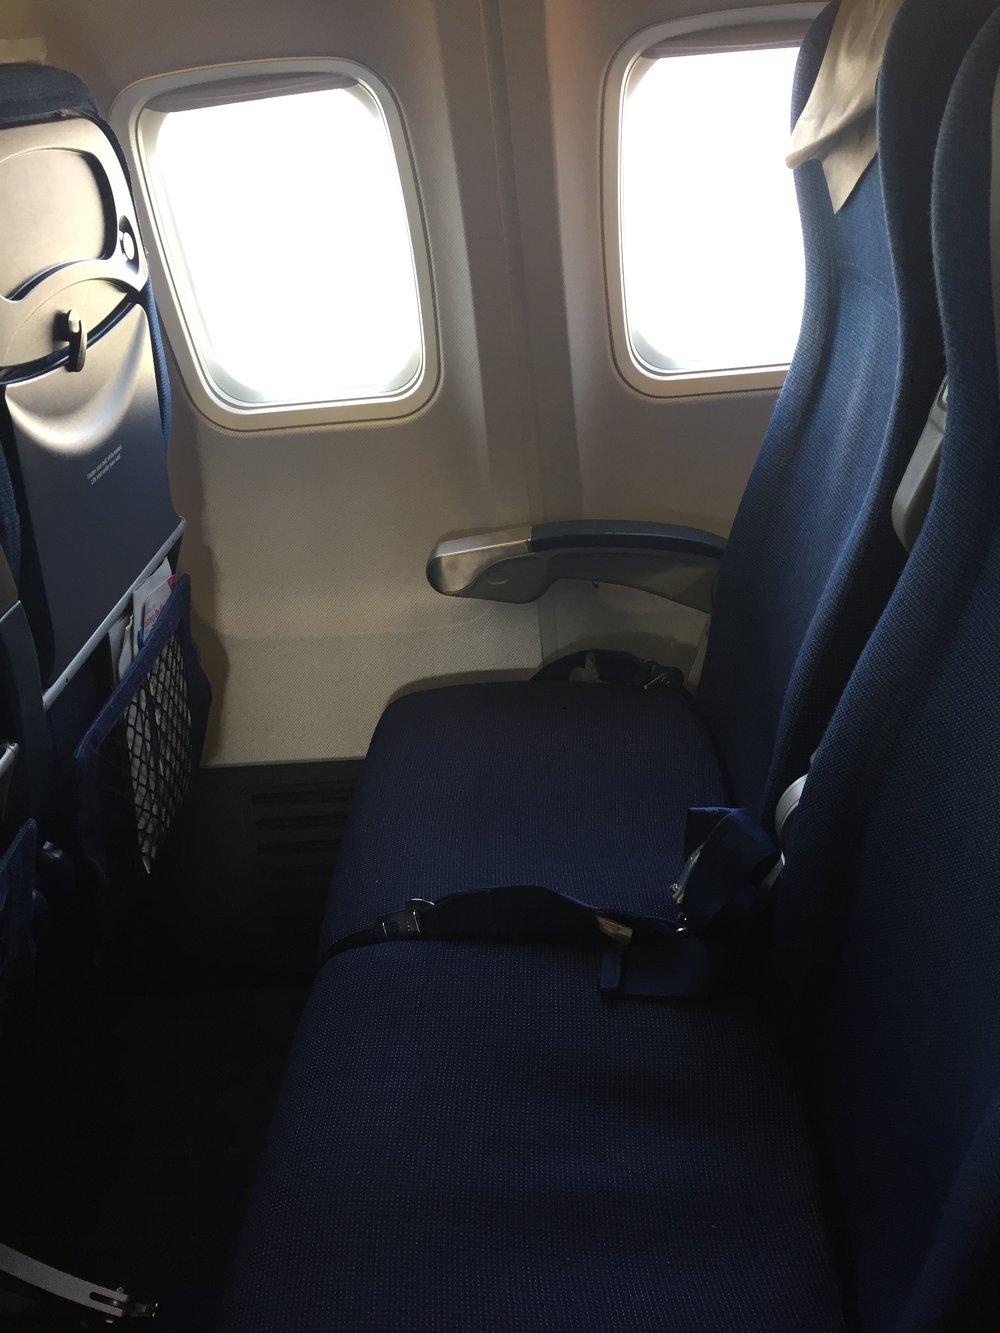 SAS seat economy.JPG